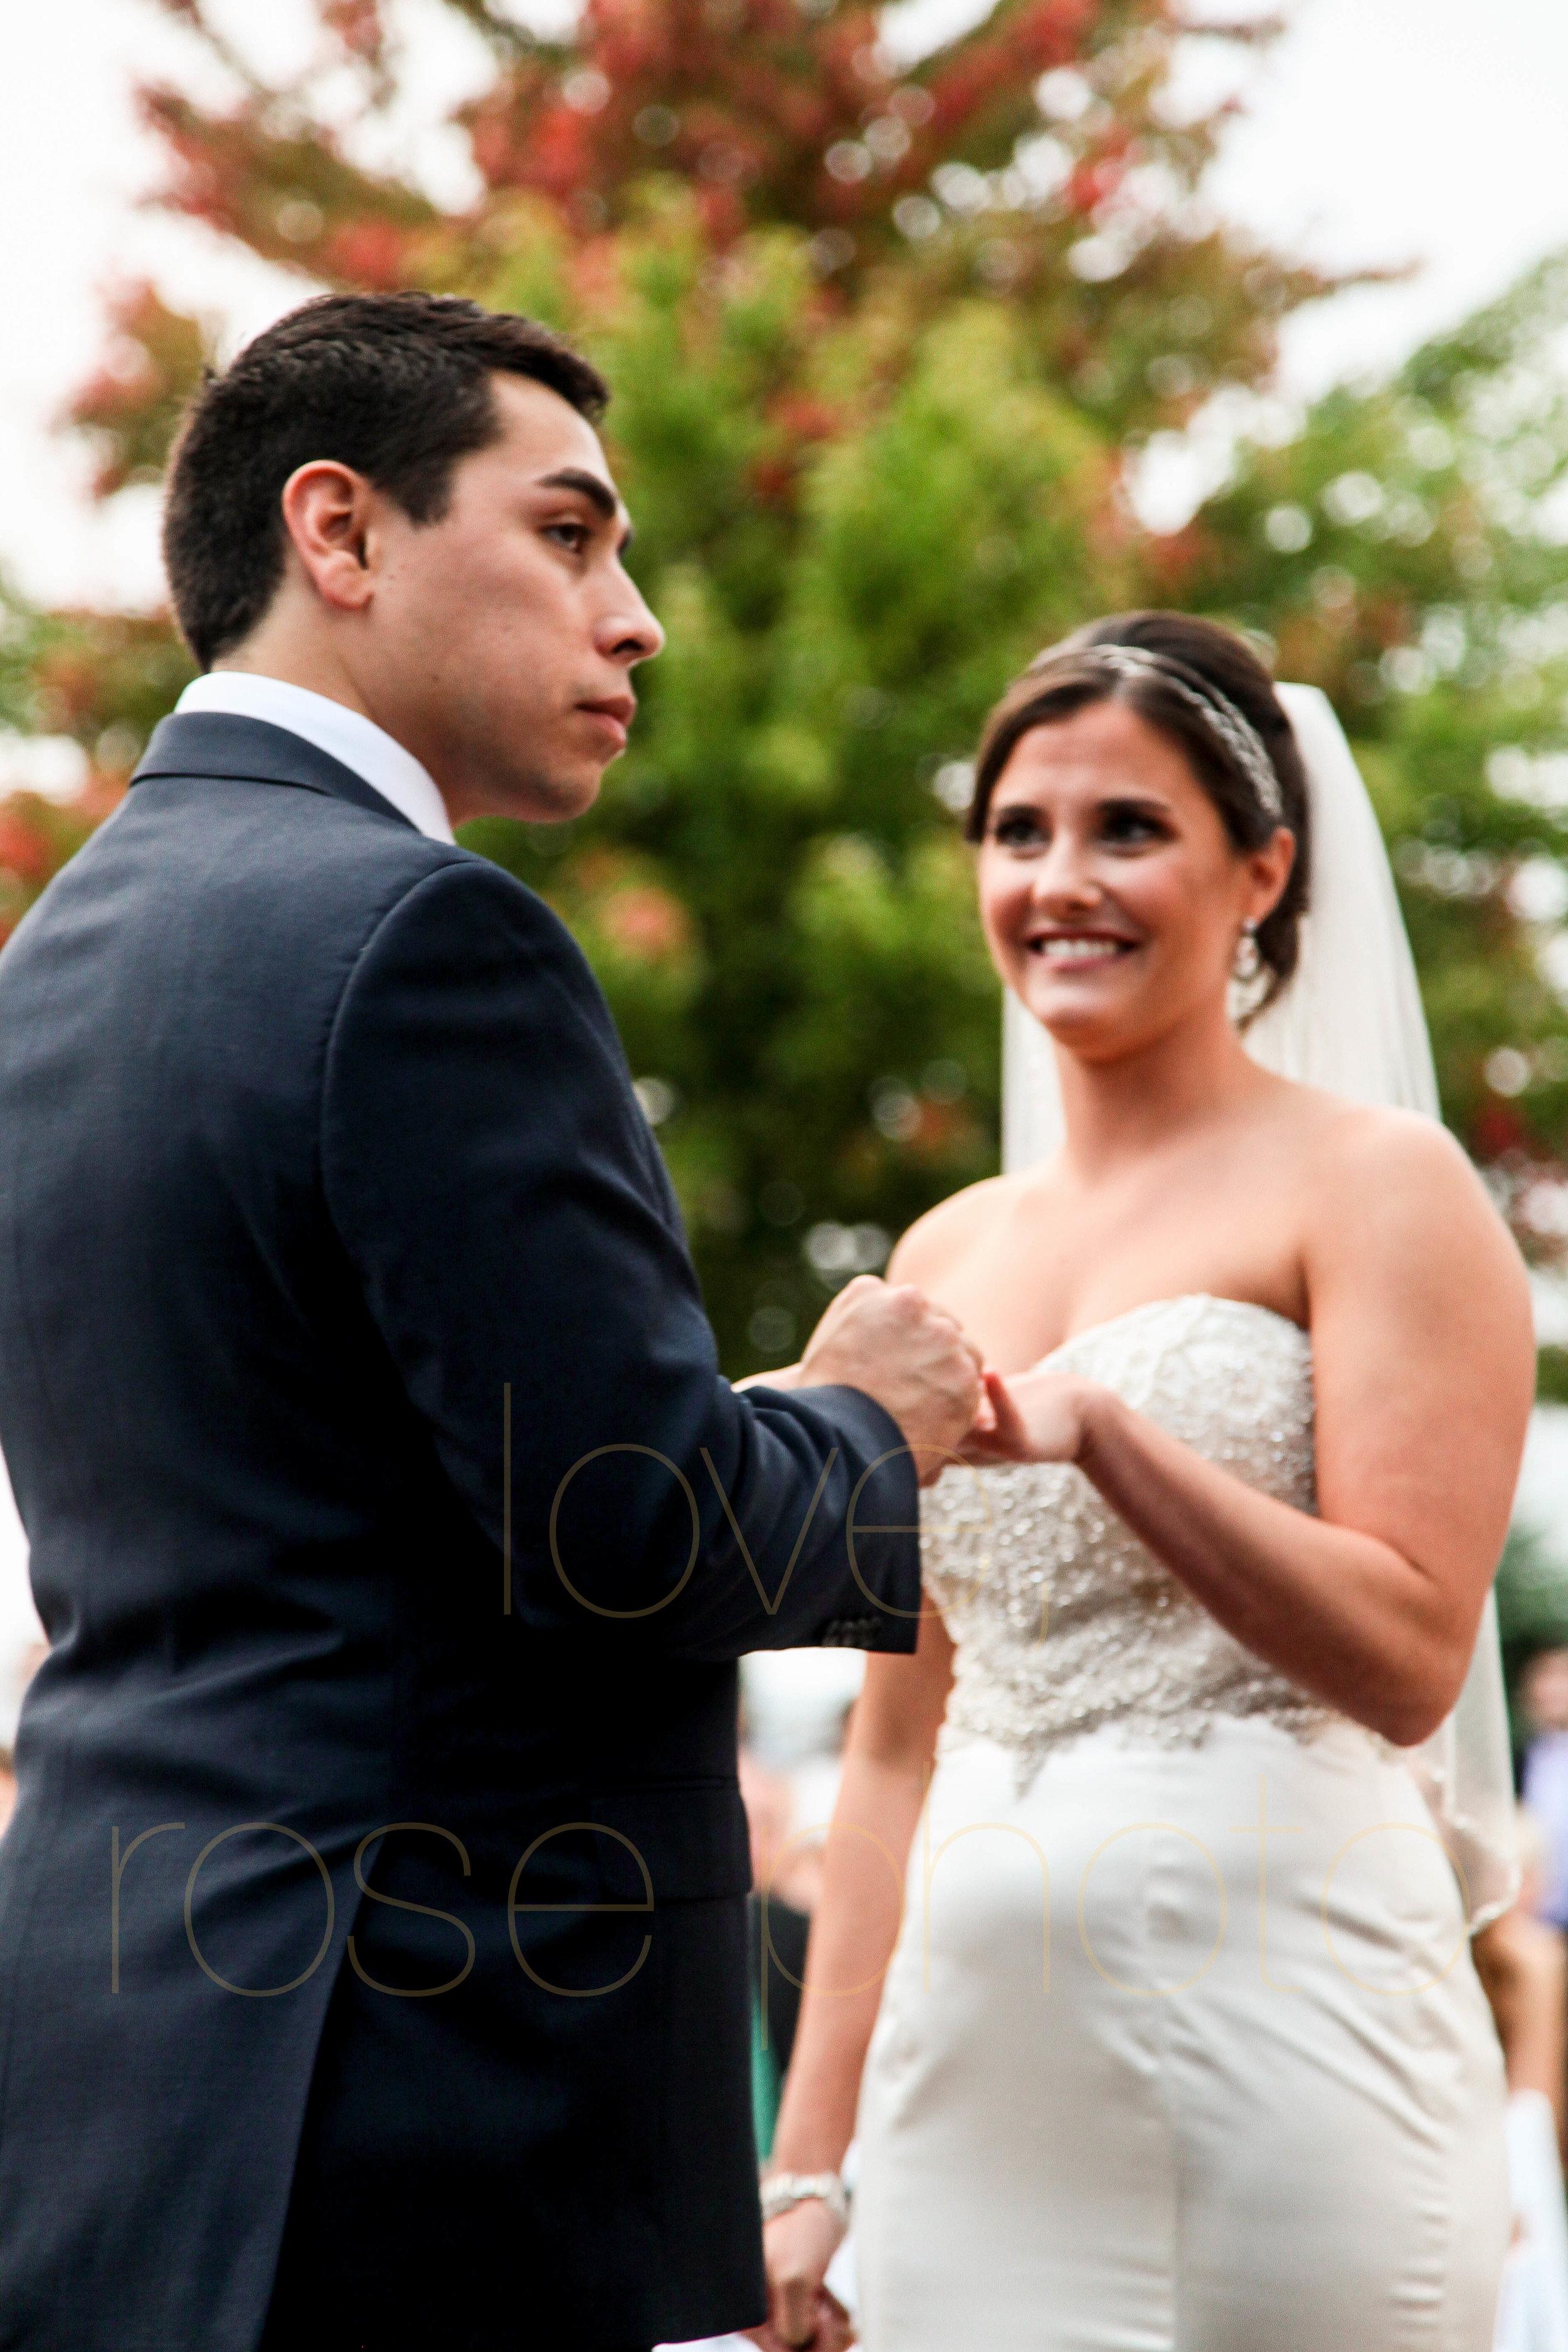 Alison + Mike Chicago Wedding Photographer Blog -33.jpg